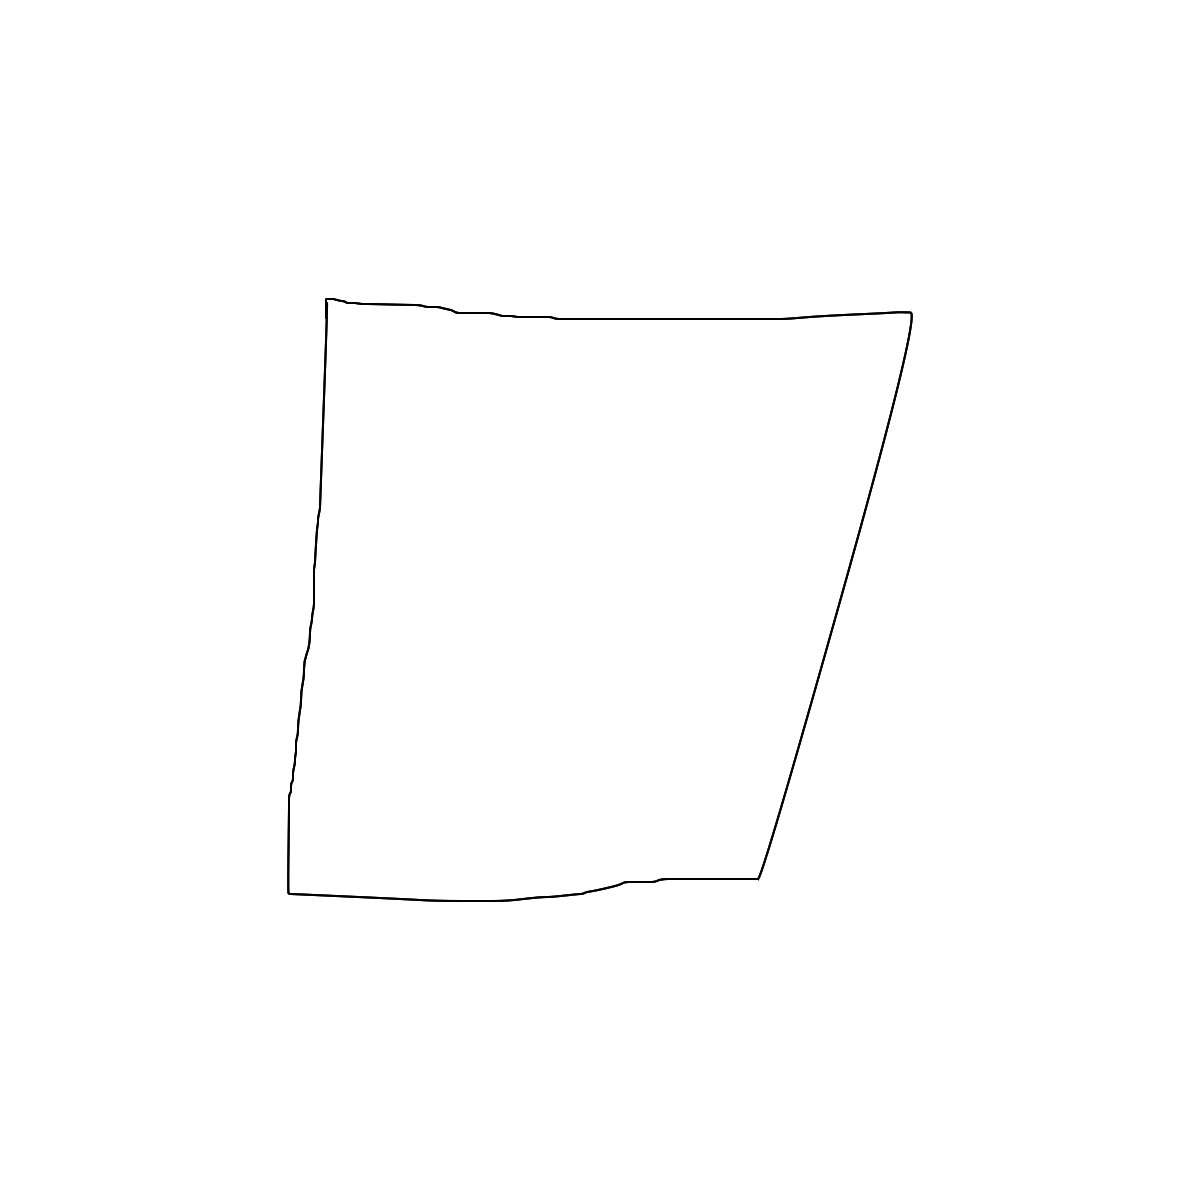 BAAAM drawing#18816 lat:55.7507438659668000lng: 37.6162986755371100